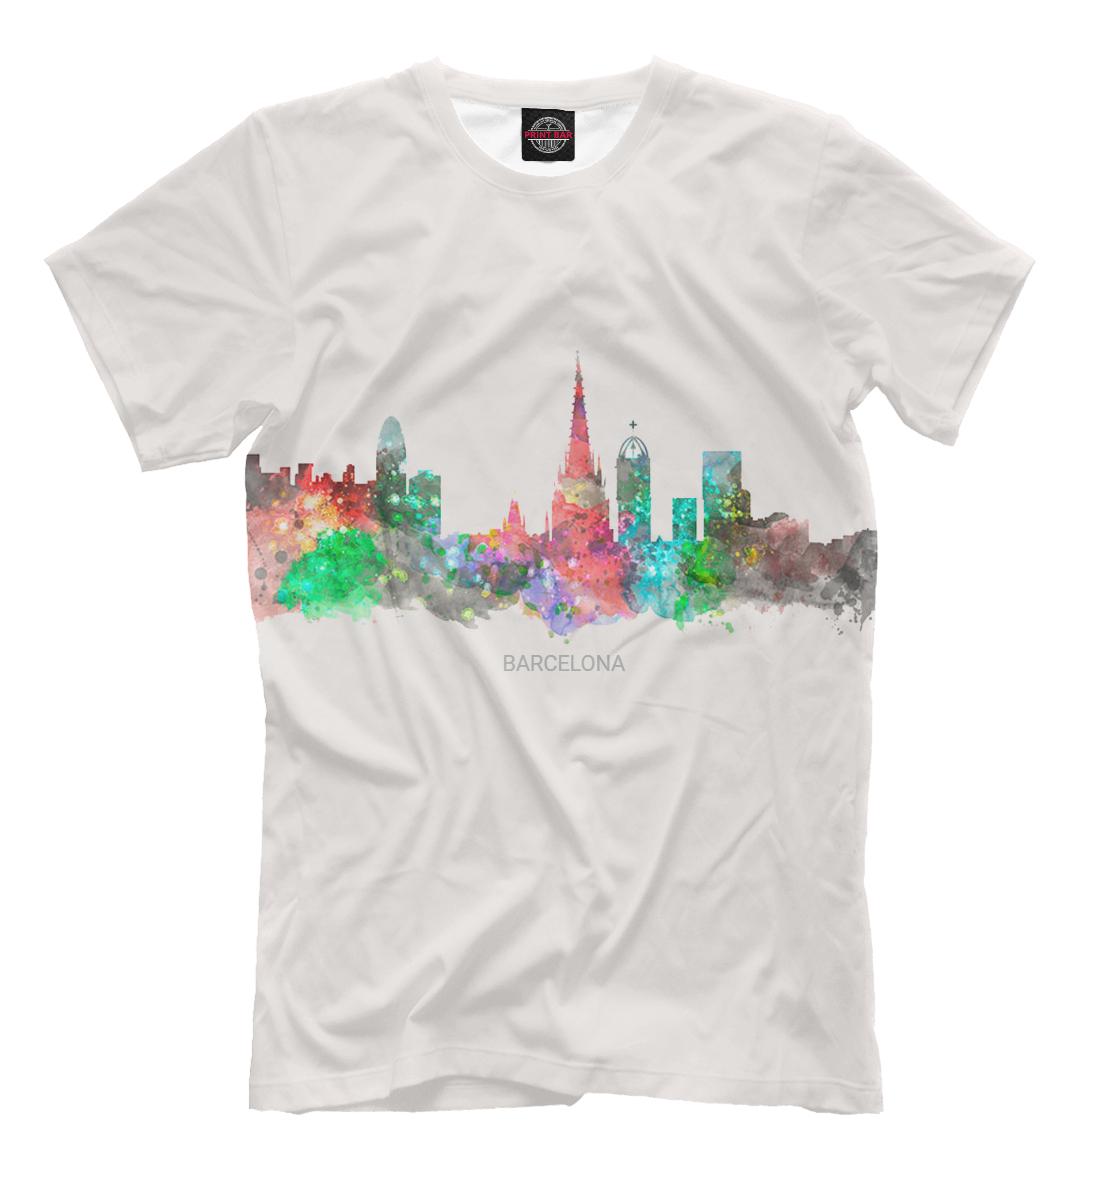 Купить Барселона, Printbar, Футболки, CTS-813687-fut-2